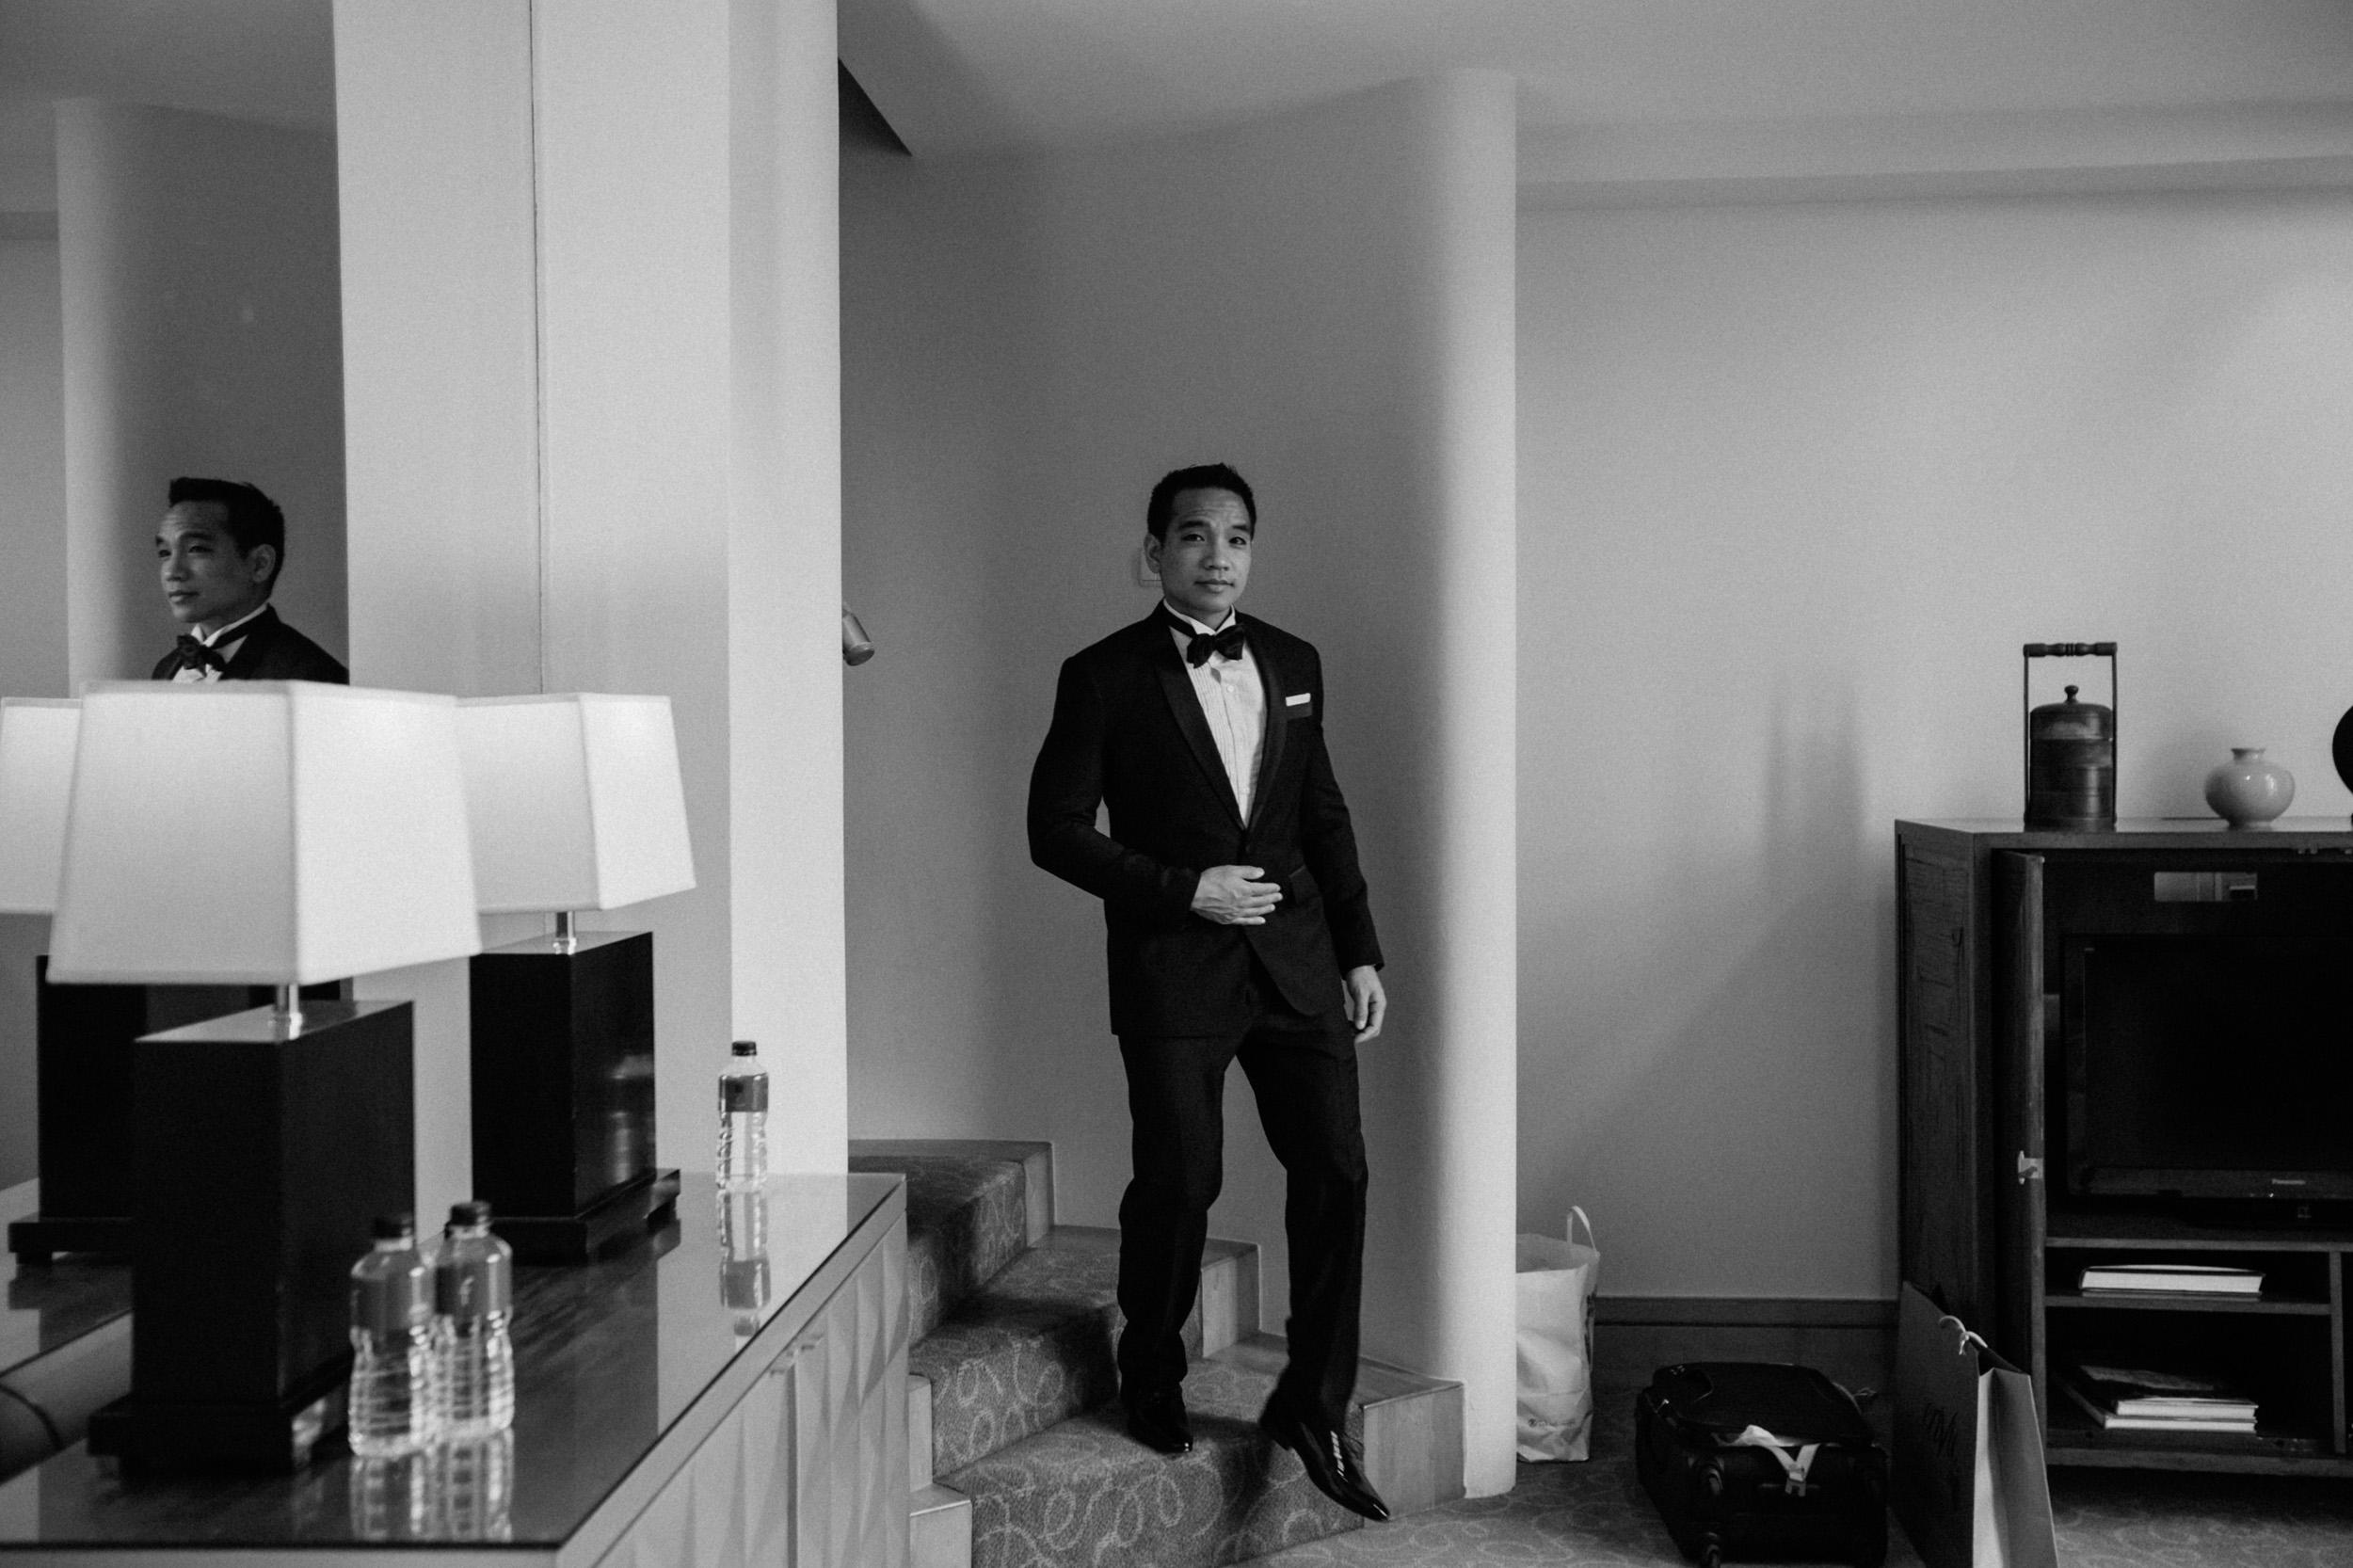 singapore-wedding-photographer-photography-wmt2017-098.jpg